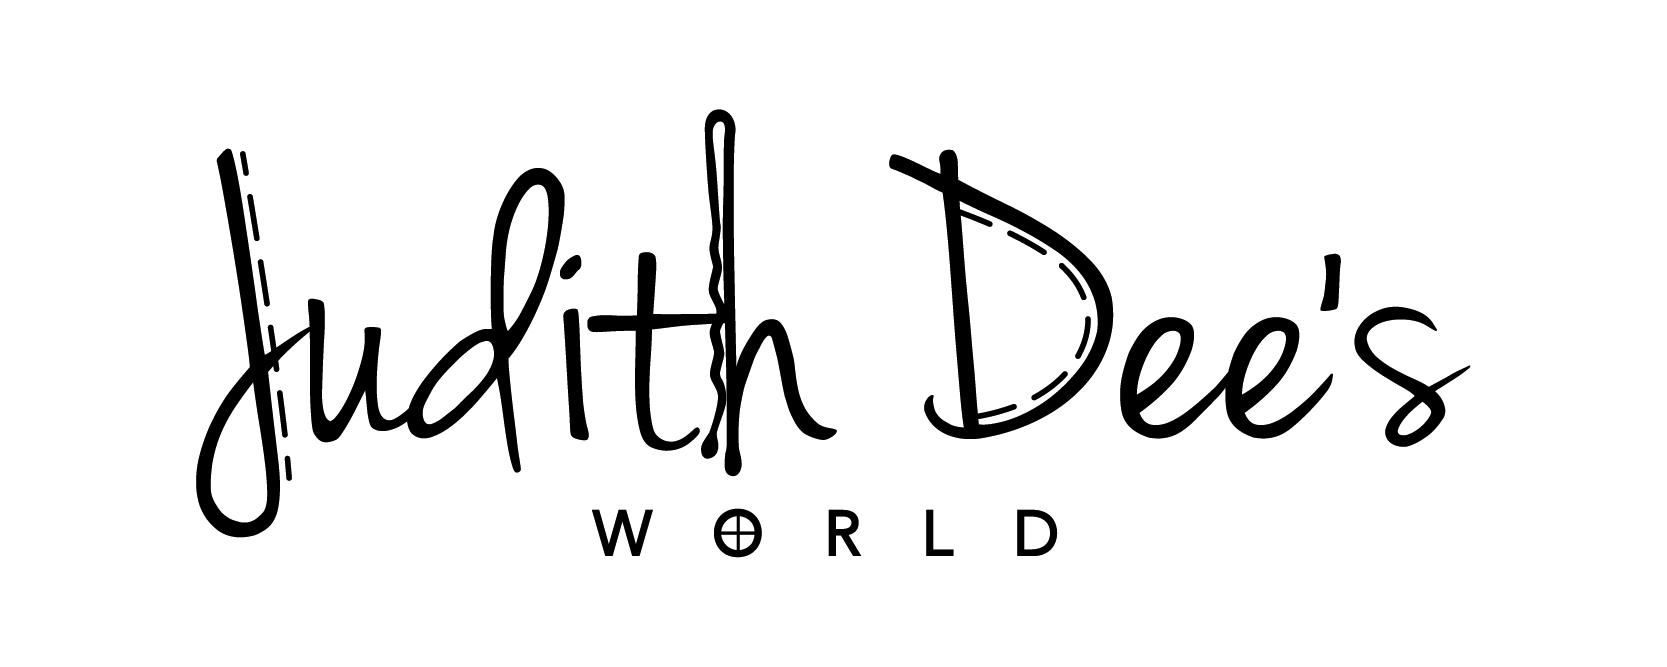 JUDITH_DEES_WORLD_300x120 px_black